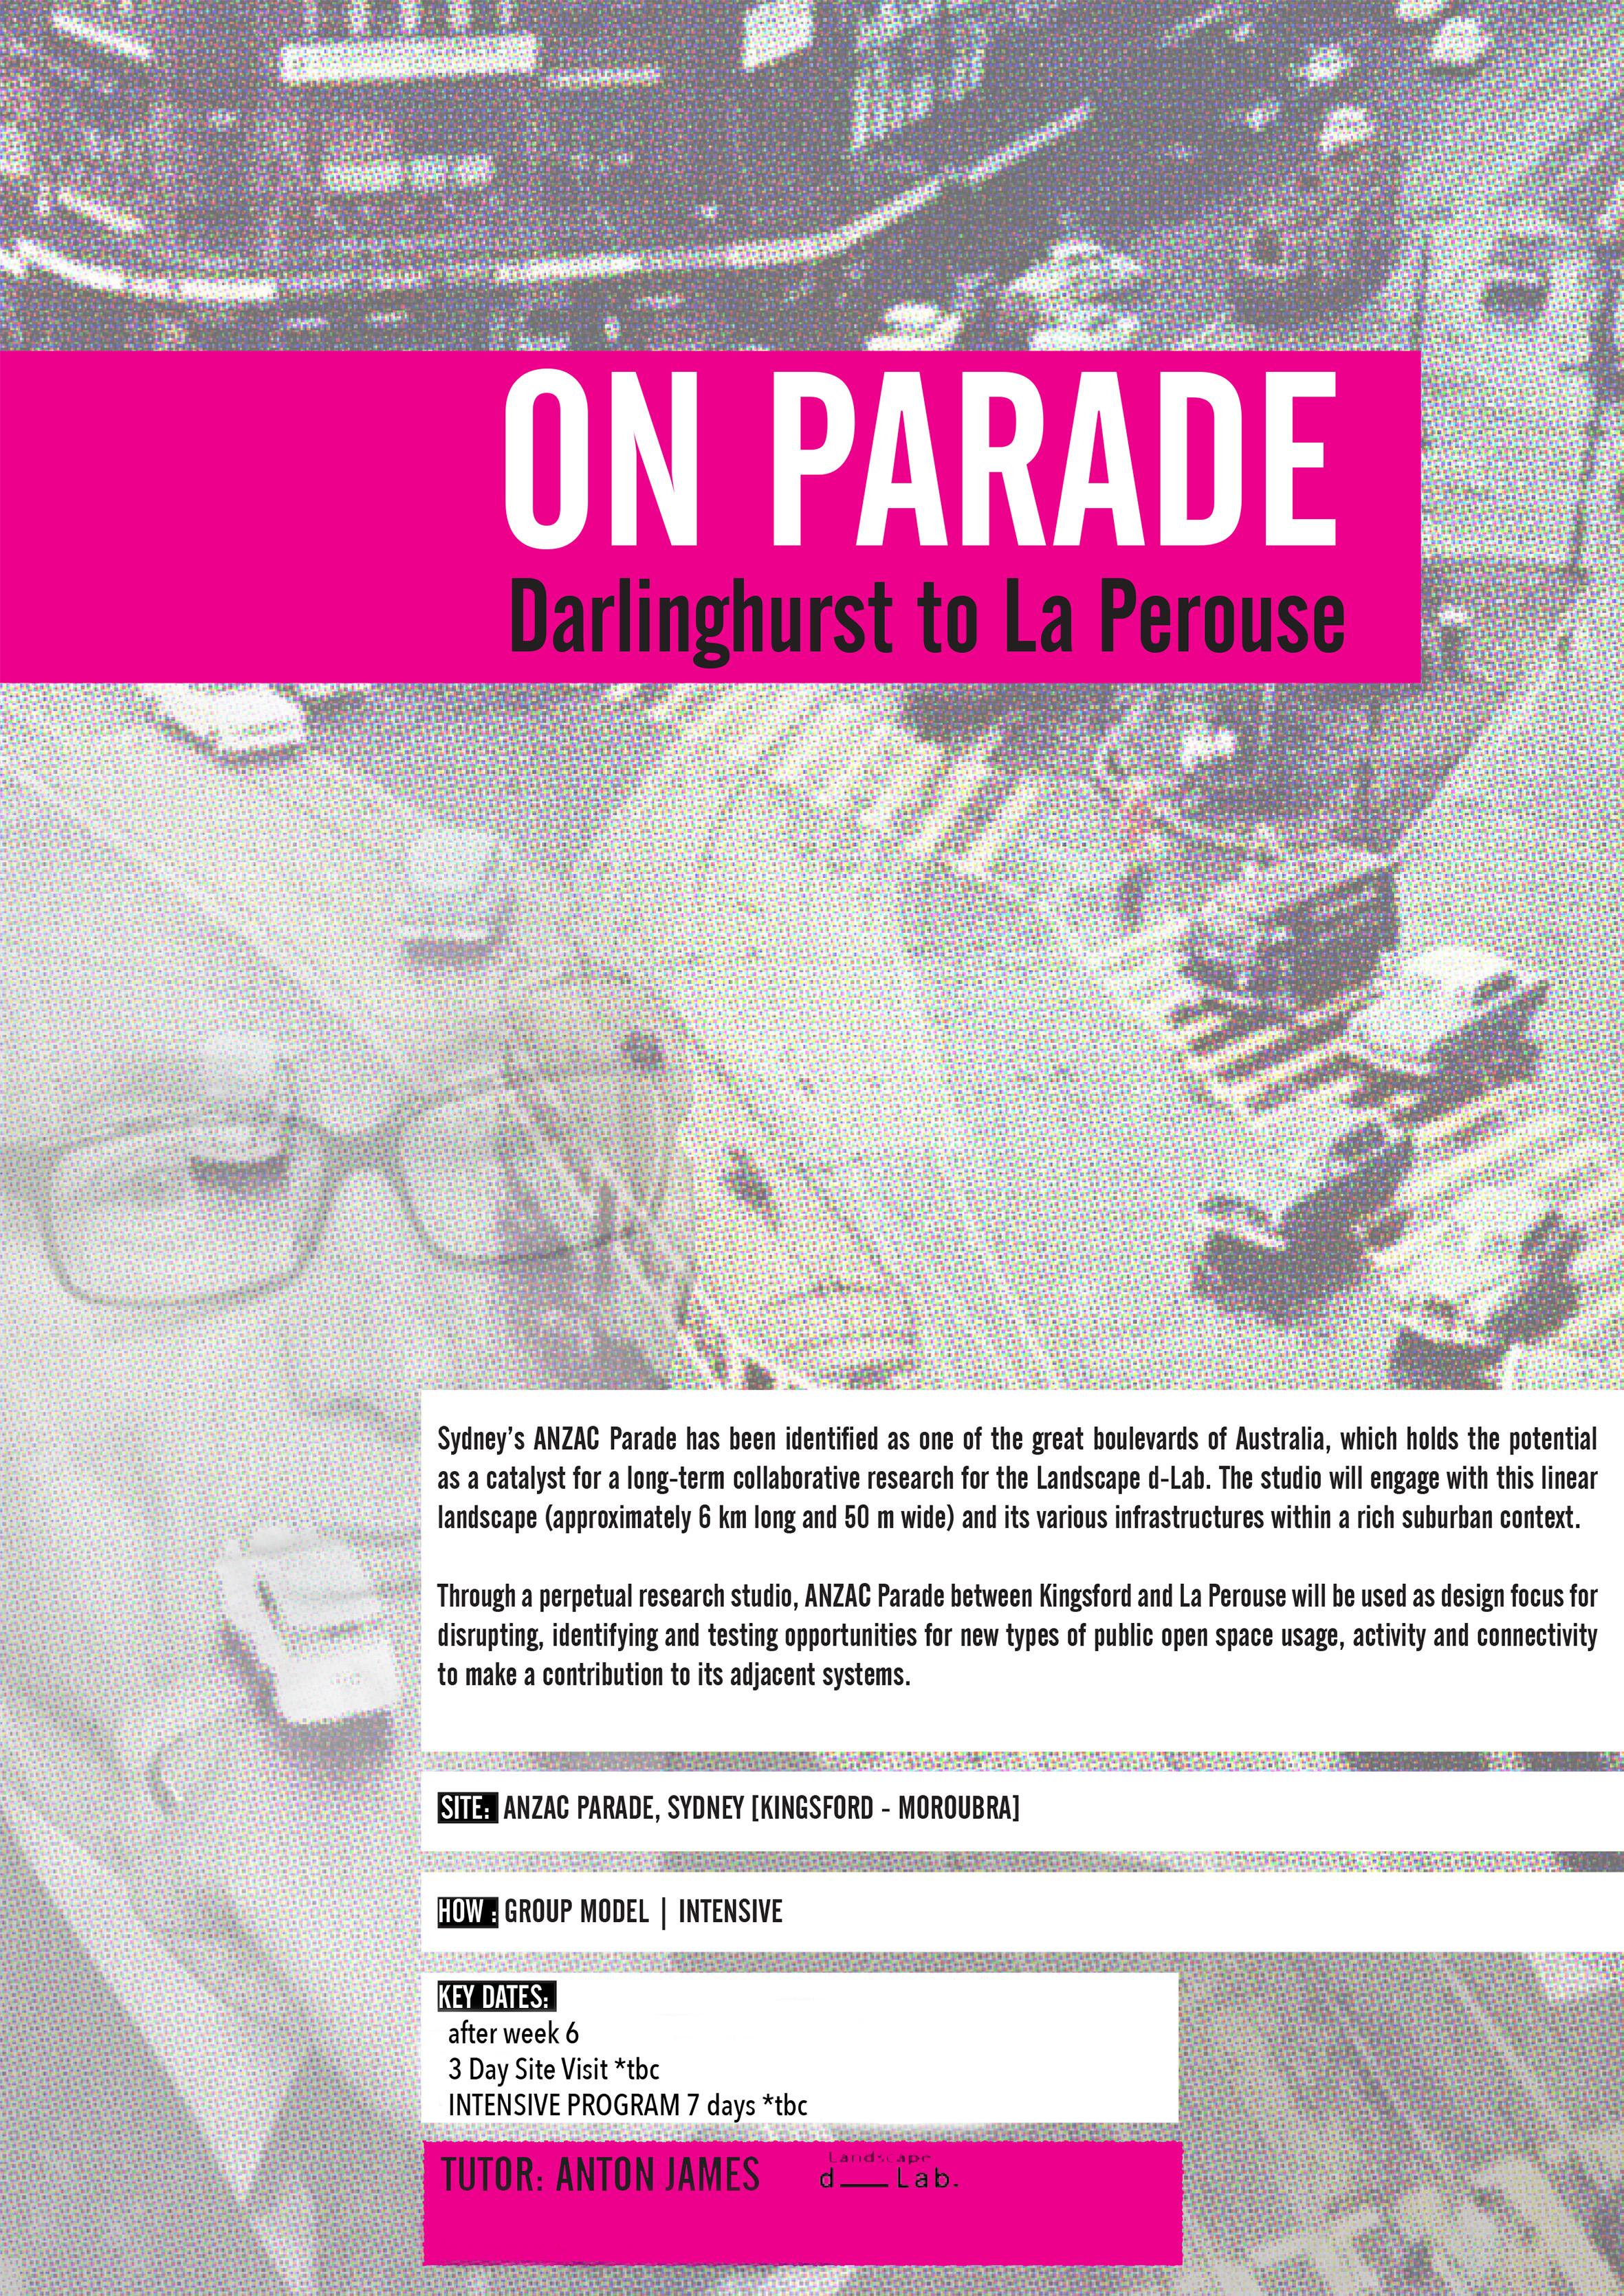 ON PARADE_poster-2.jpg